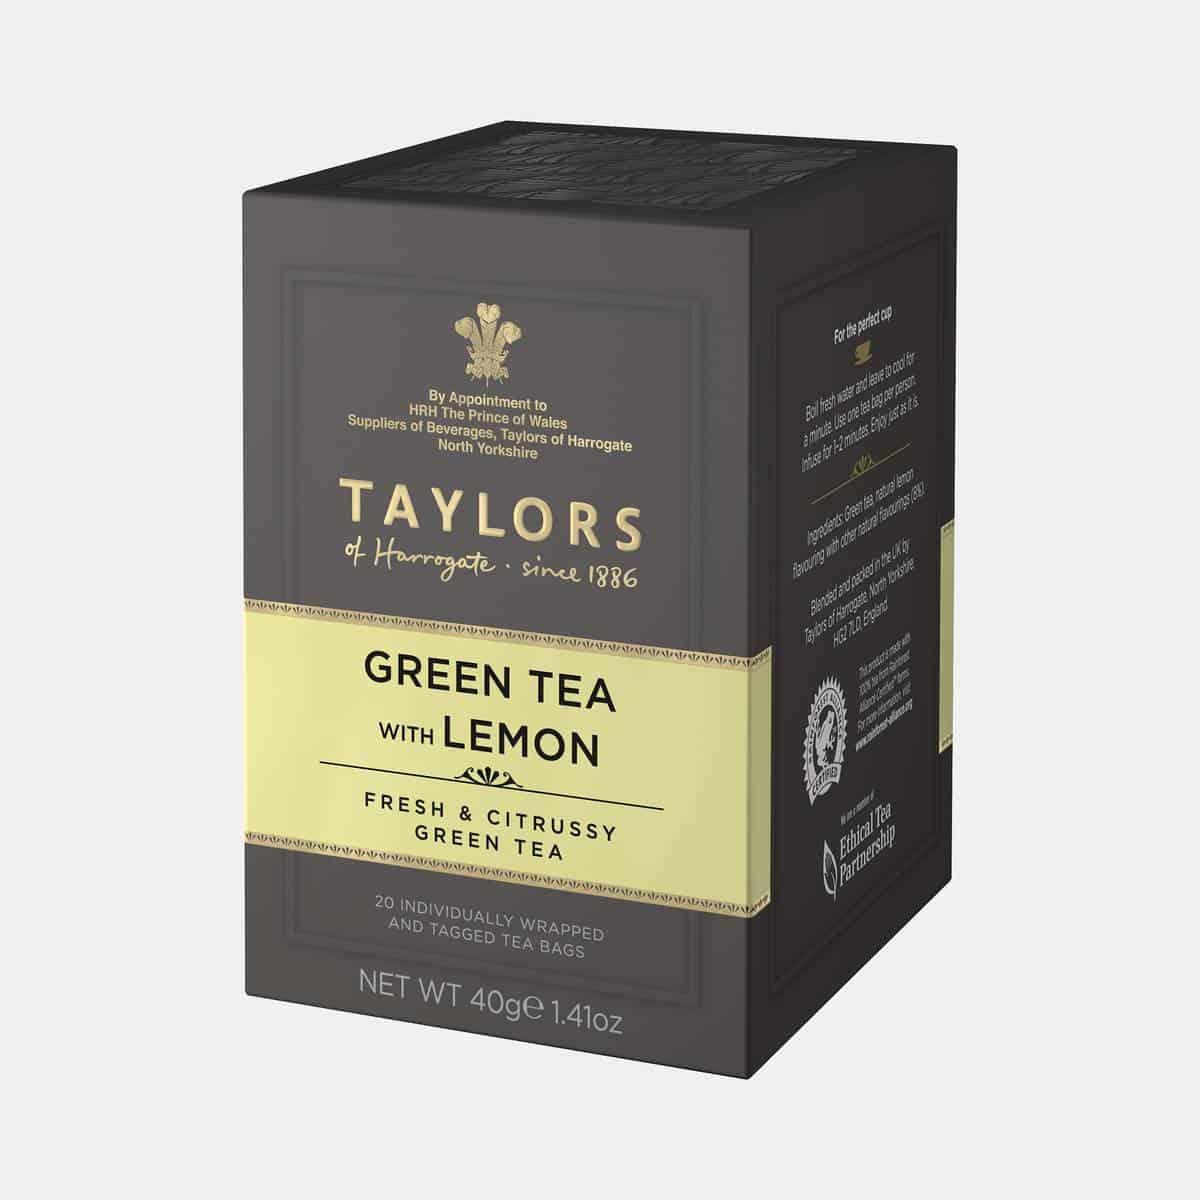 Taylors of Harrogate Green Tea with Lemon 40g